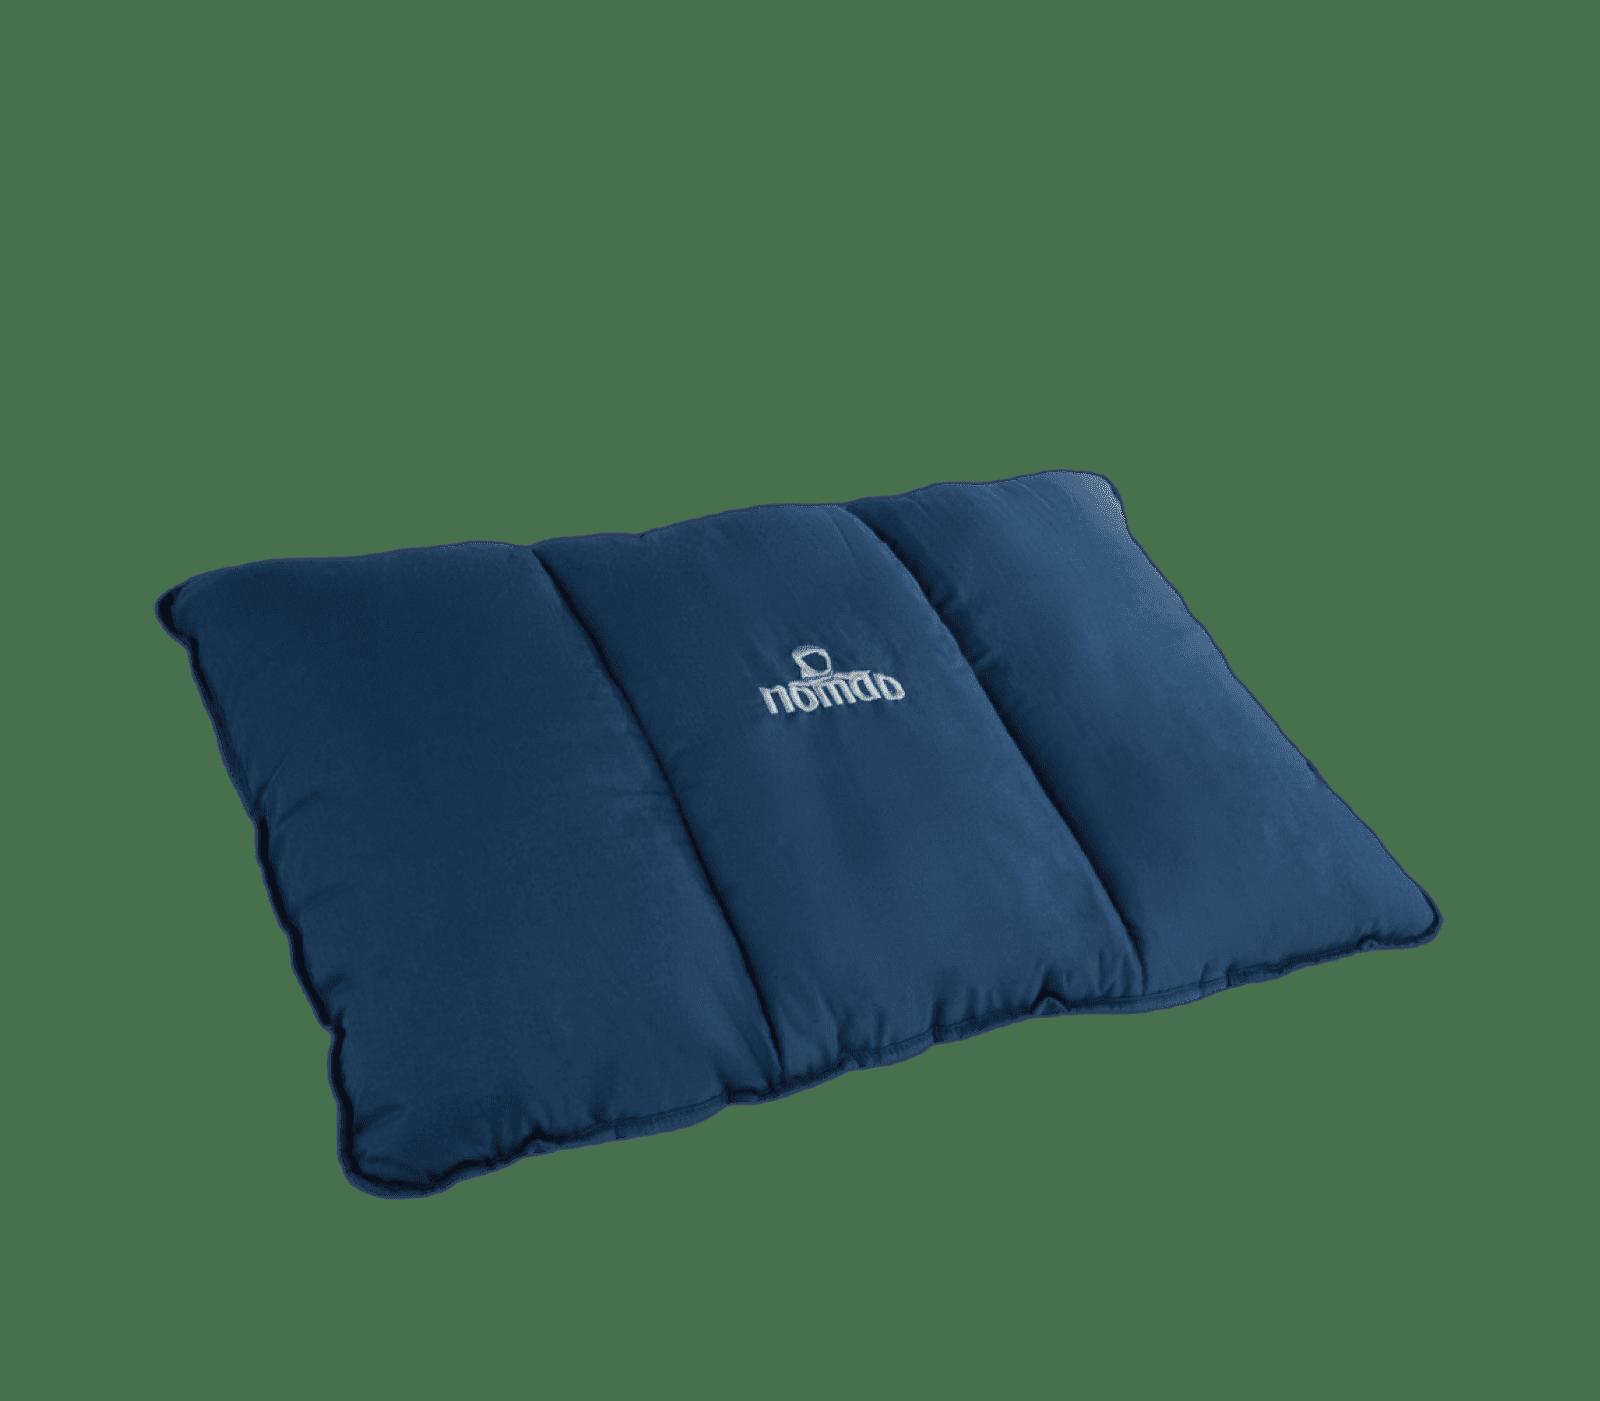 Wollip travel pillow